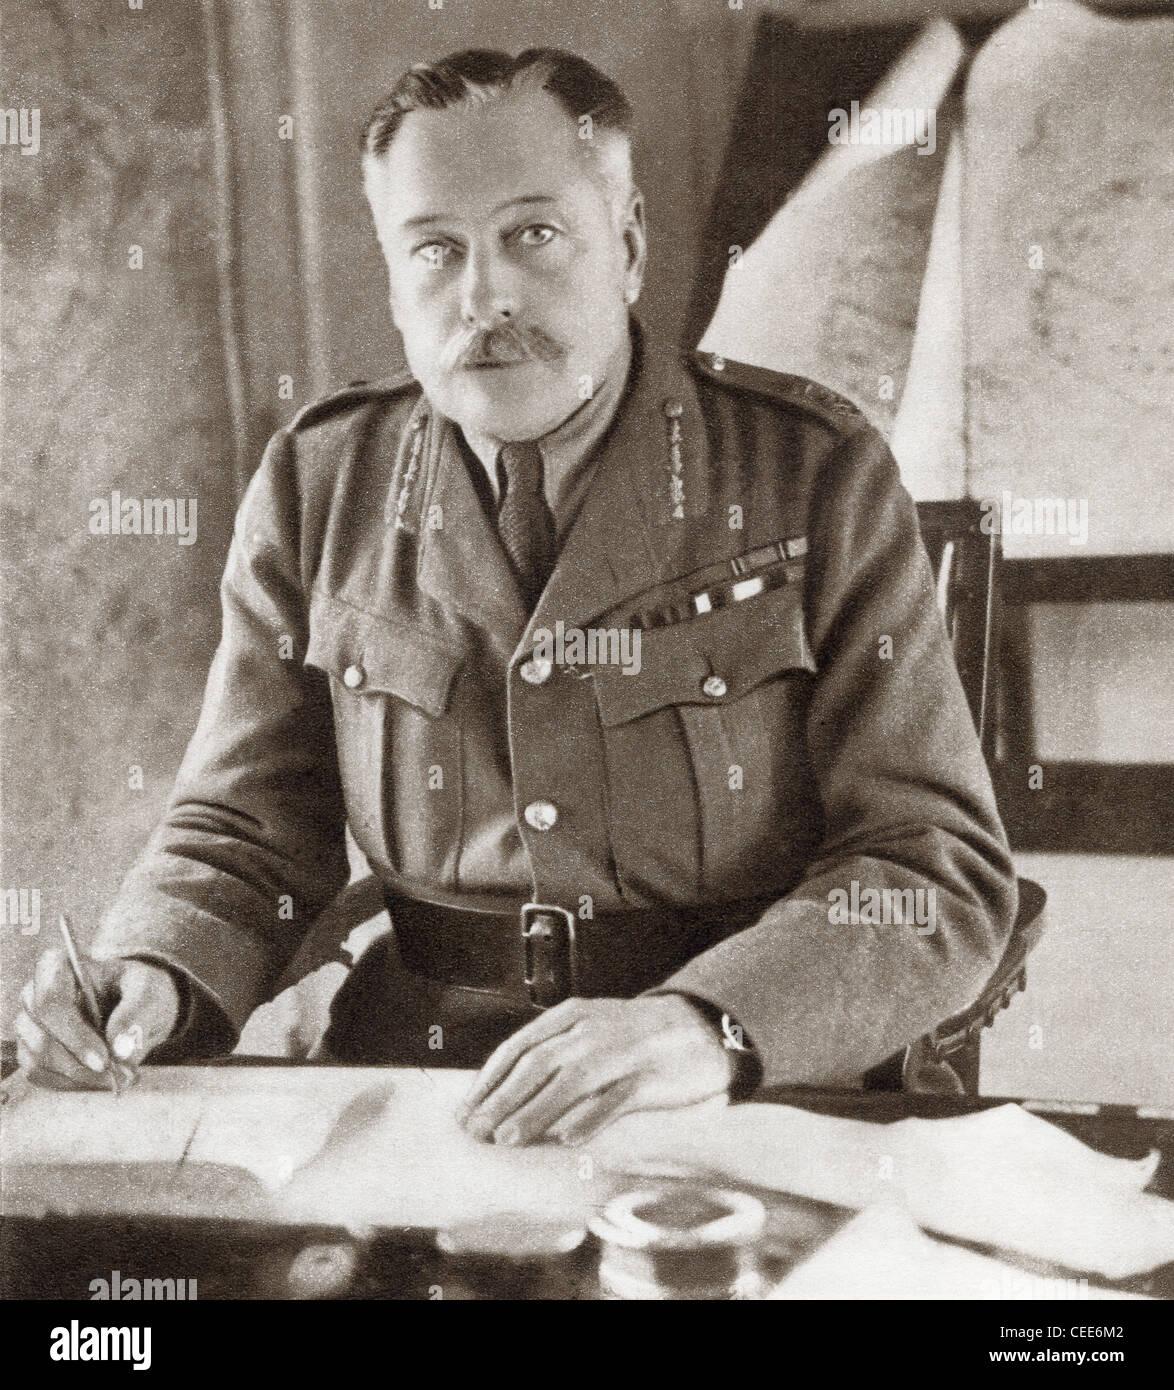 Field Marshal Douglas Haig, 1st Earl Haig, 1861 – 1928. British senior officer during World War I. Stock Photo